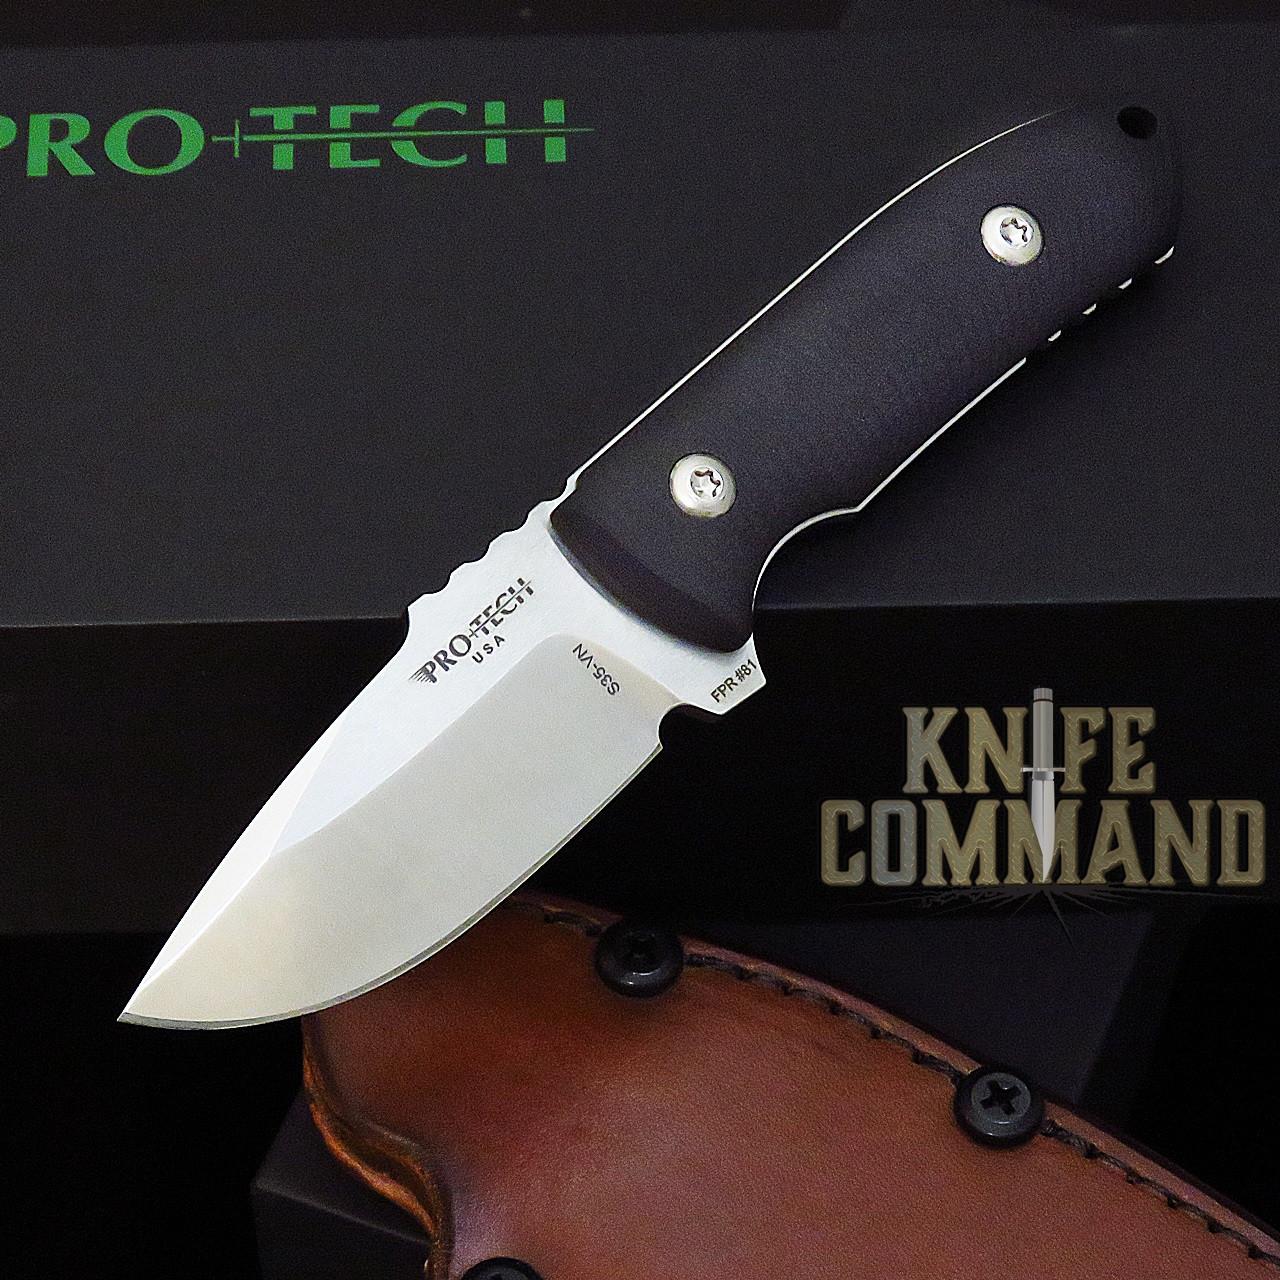 Pro-Tech Knives SBR Short Blade Rockeye Fixed Blade Knife LG502 Les George Satin S35VN Blade Leather Sheath